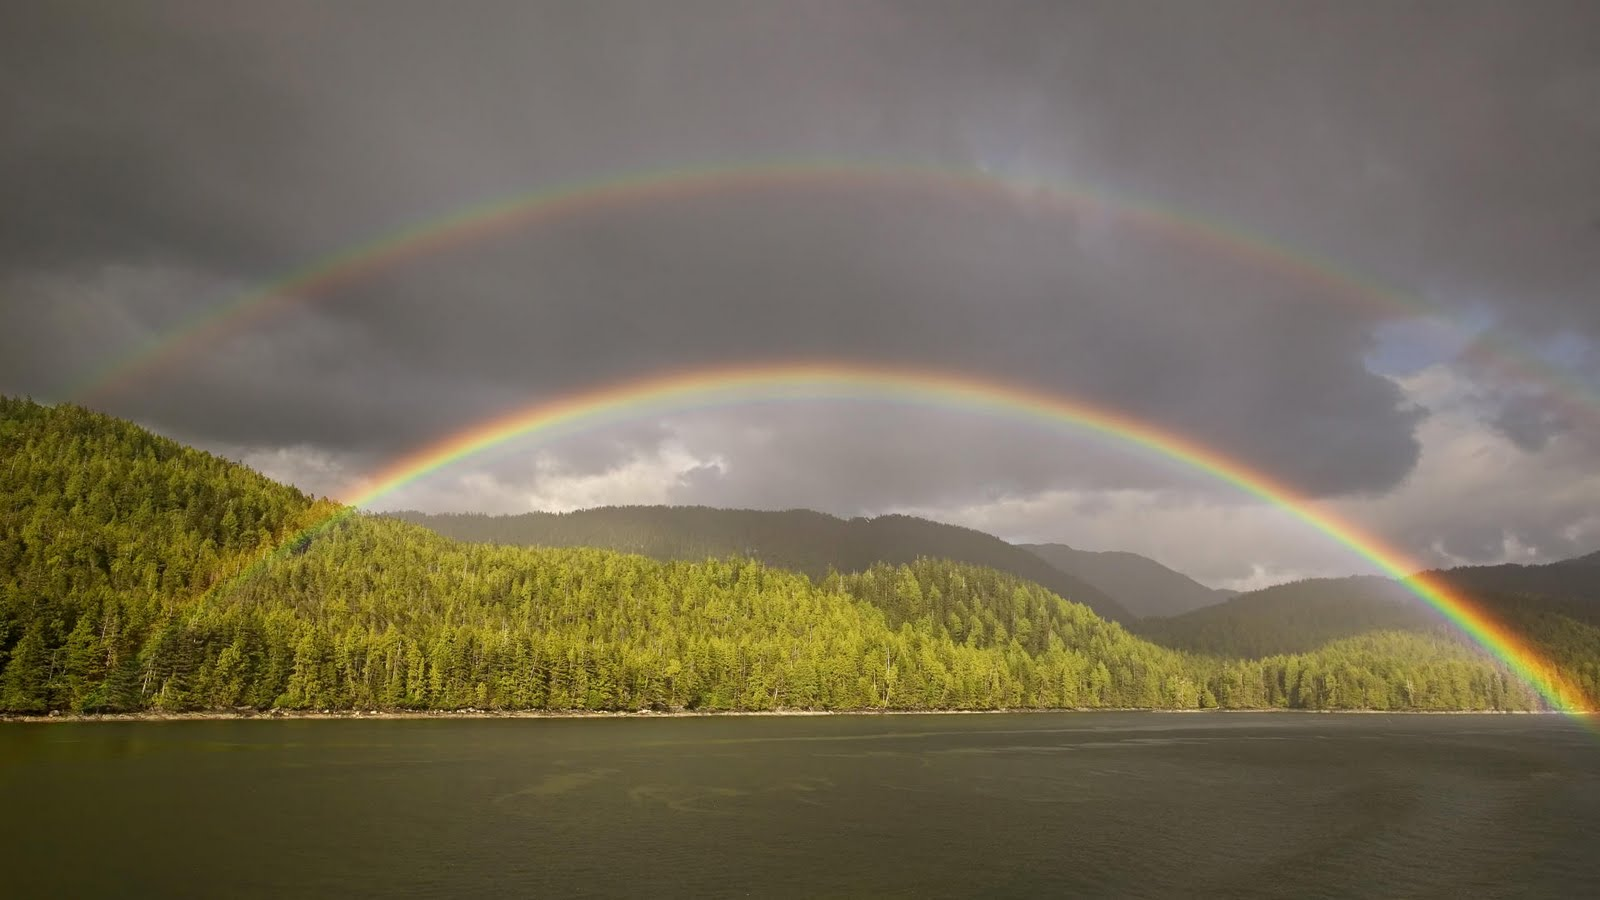 real rainbow wallpaper - photo #19